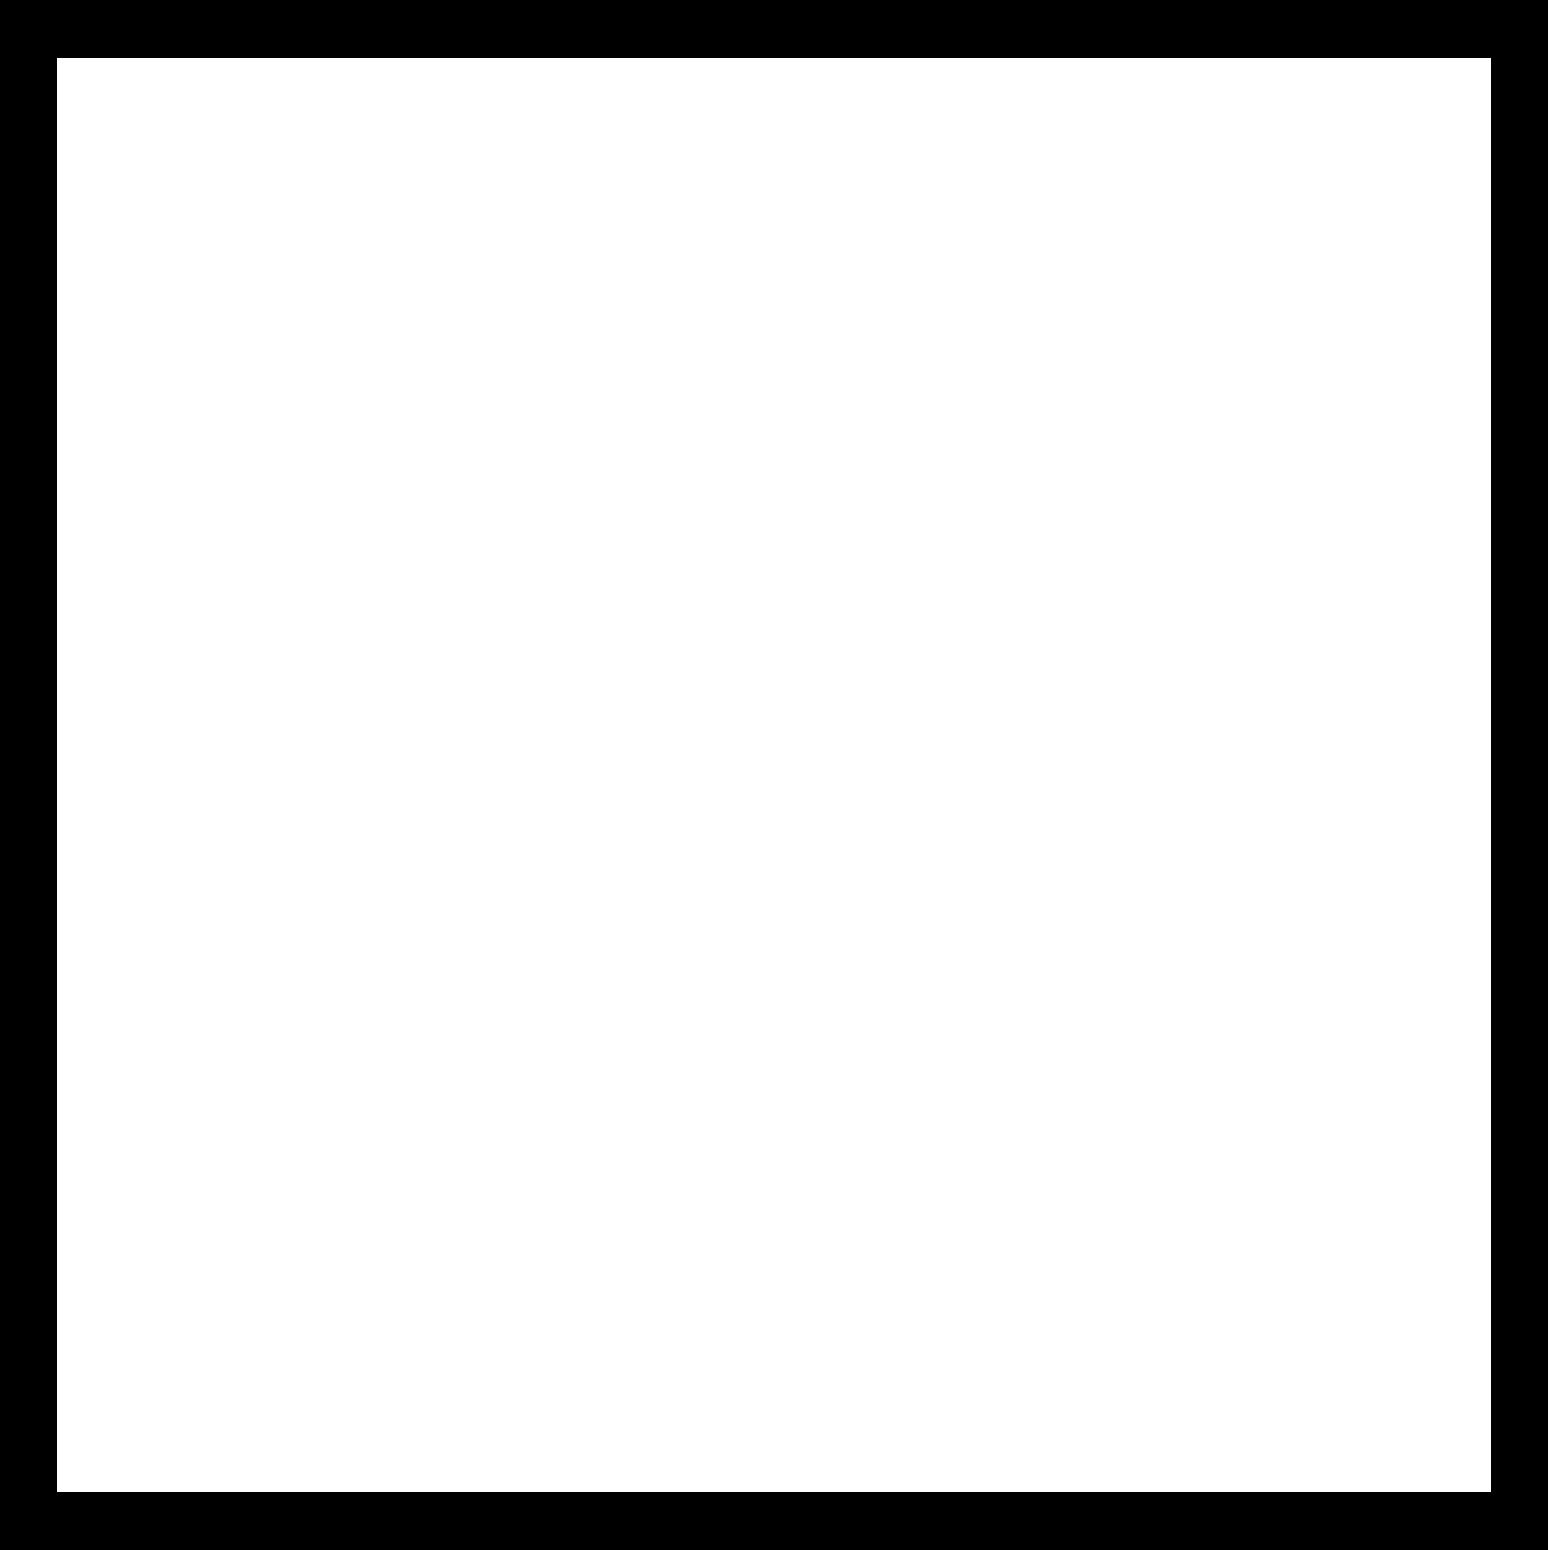 emoney logo.png